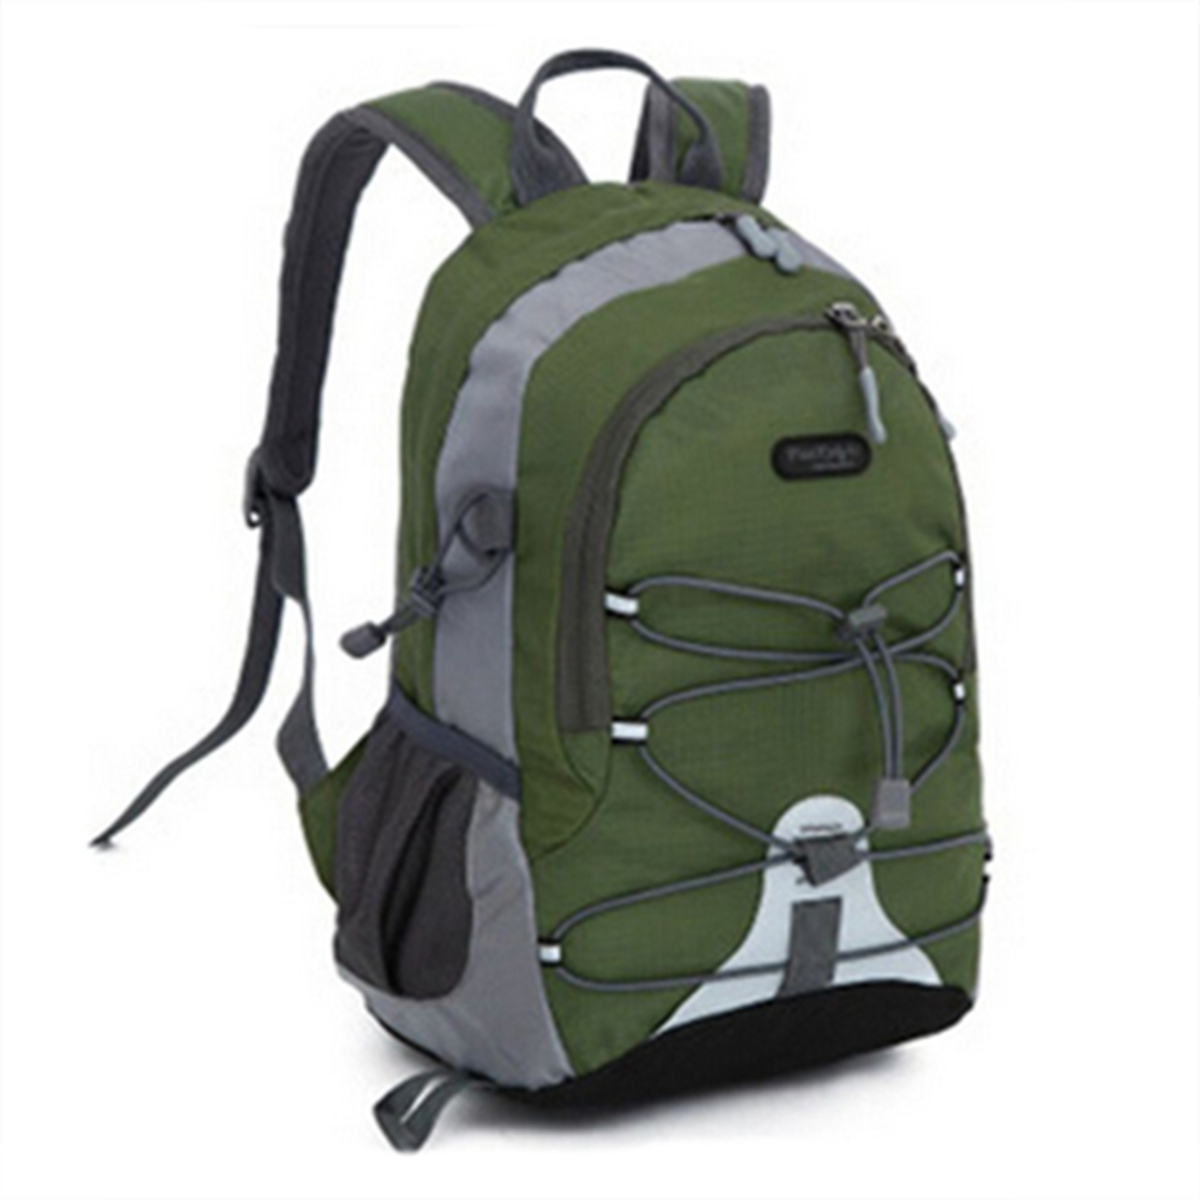 Children Kids Outdoor Sport Backpack Camping Rucksack Hiking Canvas Travel Bag